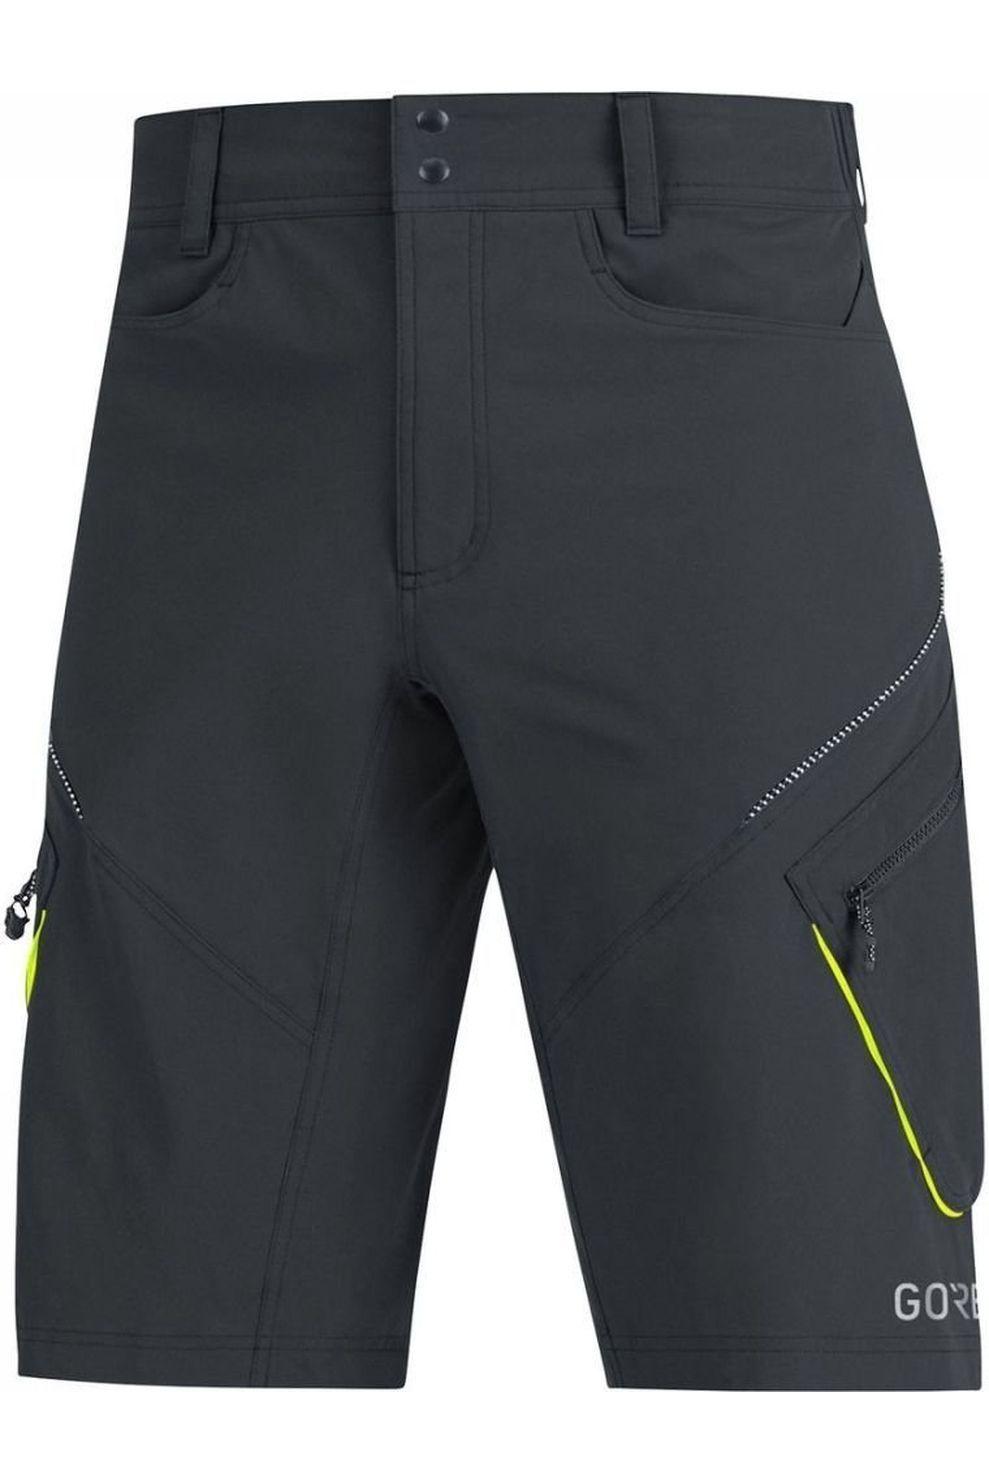 GORE WEAR Broek C3 Trail Shorts voor heren - Zwart - Maten: S, M, L, XL, XXL